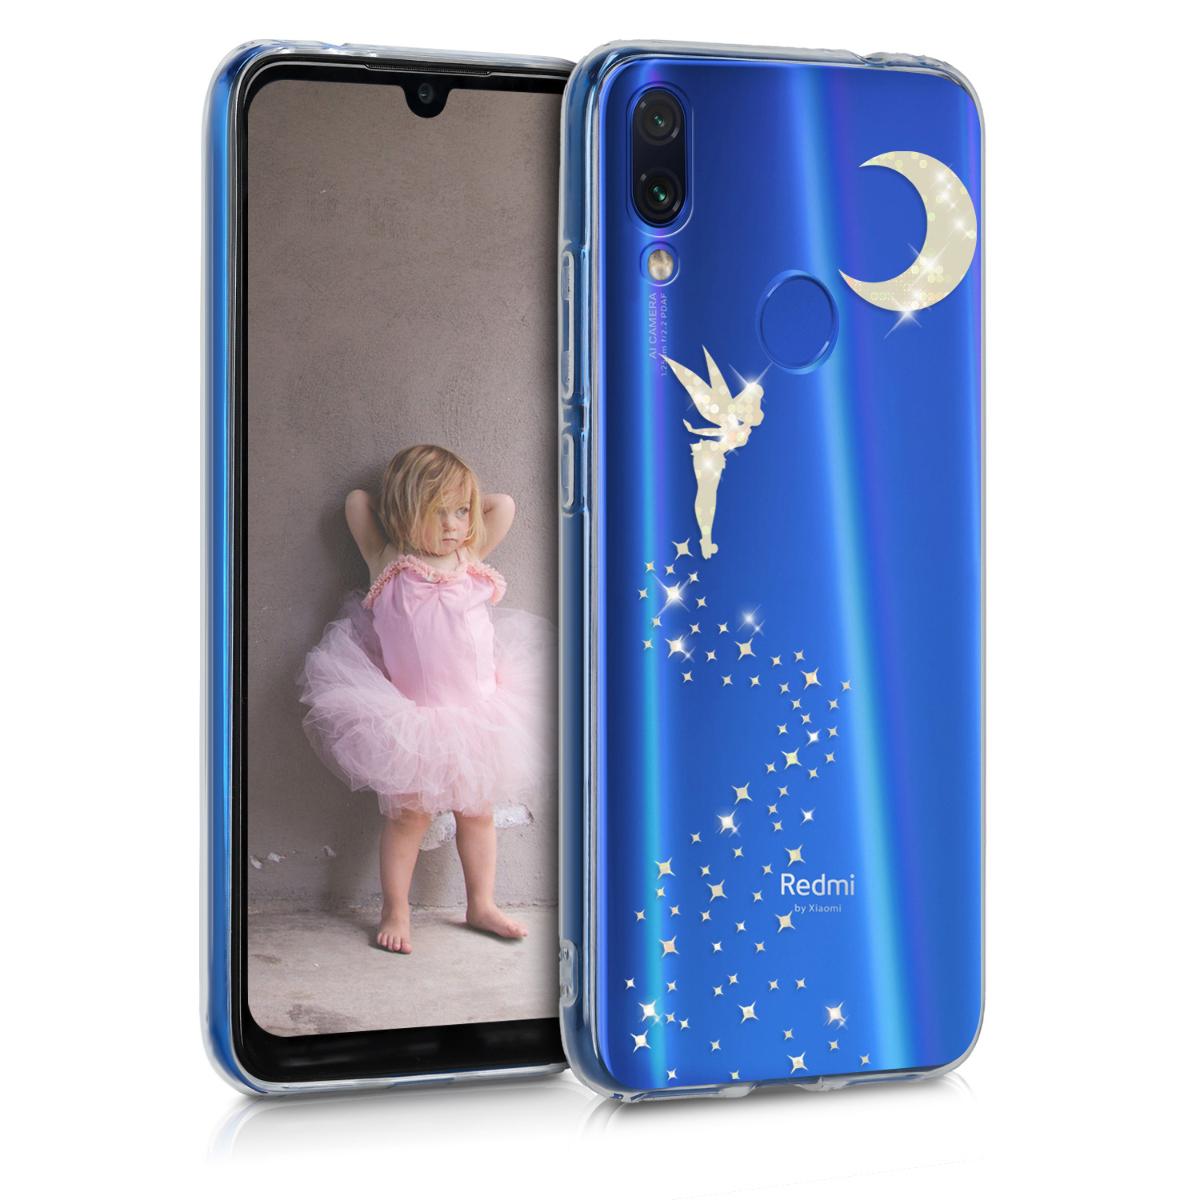 KW Θήκη Σιλικόνης Xiaomi Redmi Note 7 / Note 7 Pro - Glittery Fairy - Gold / Transparent (48154.06)